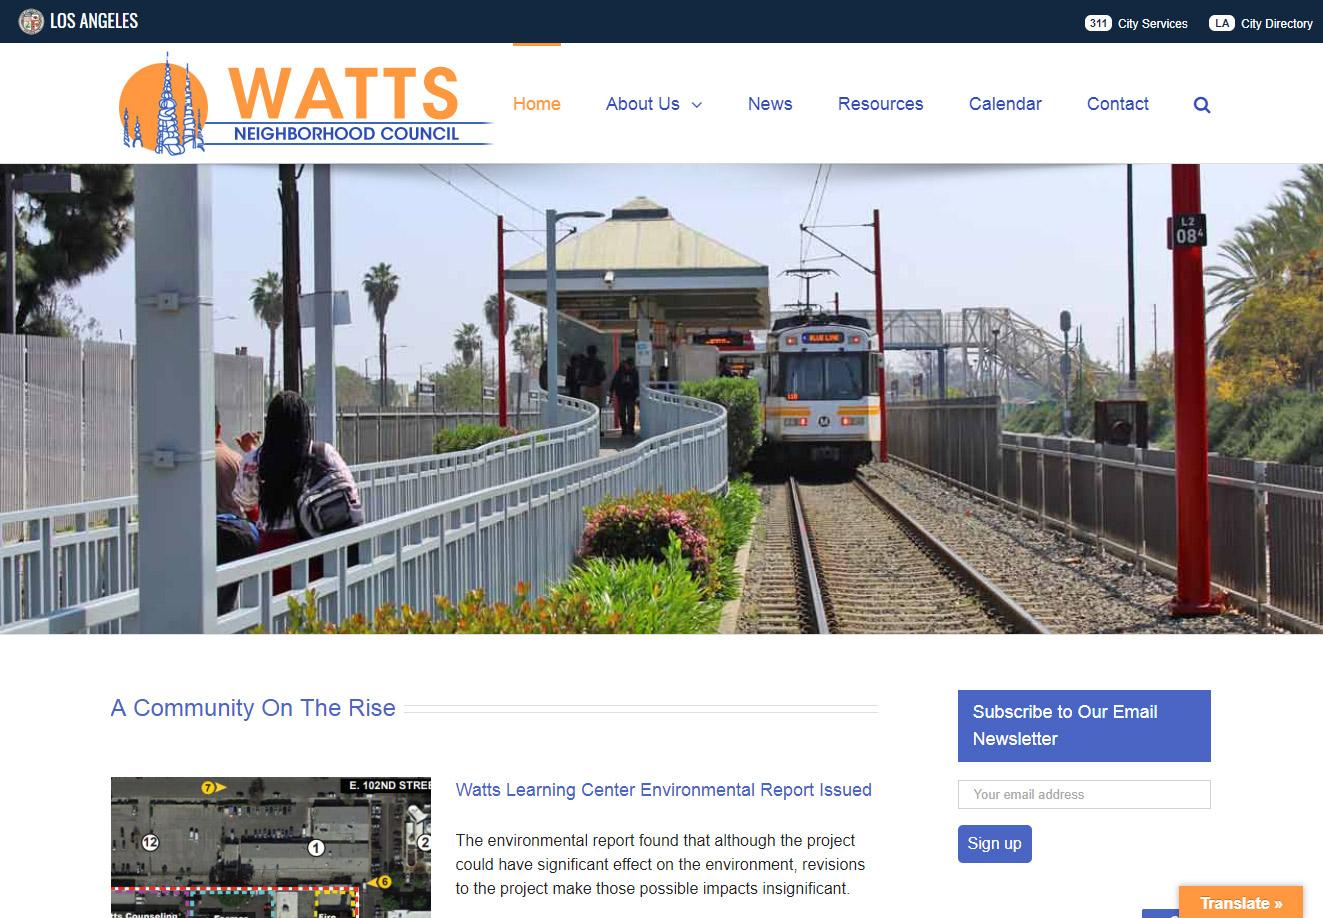 Watts Neighborhood Council Site with train